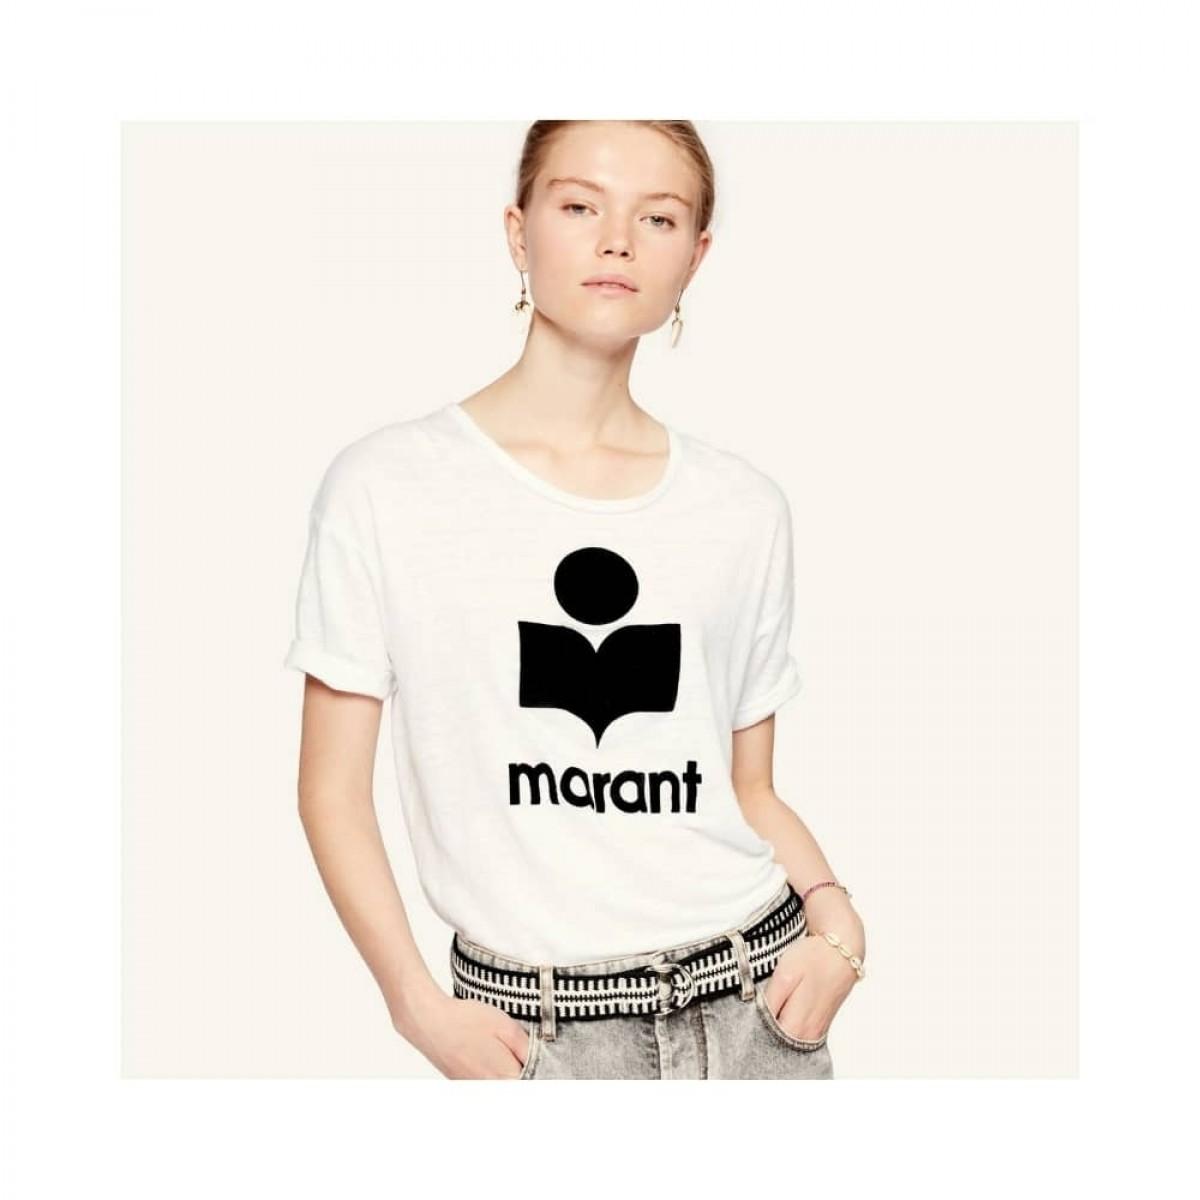 koldi t-shirt - white